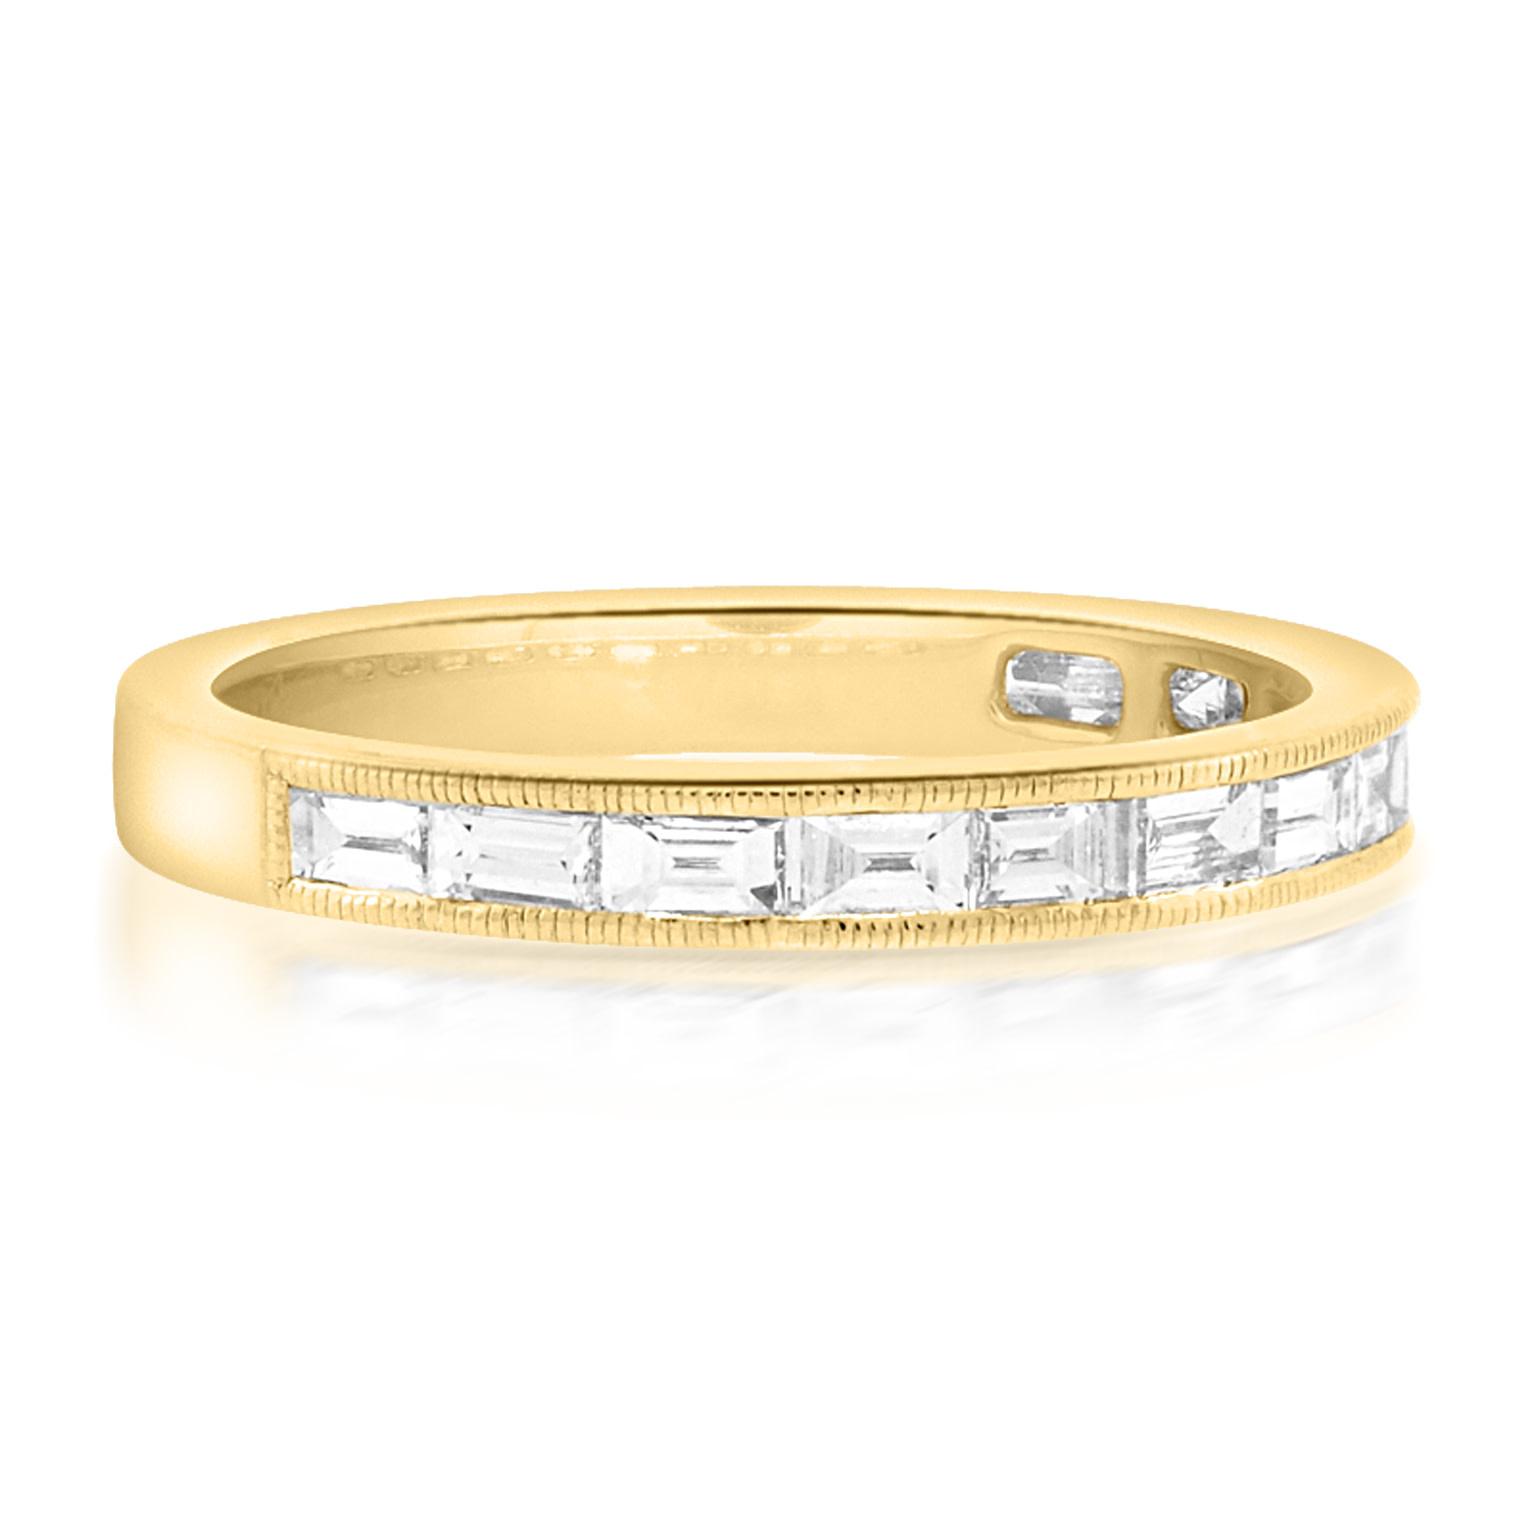 Beverley K Collection Baguette Diamond Half Eternity Gold Band